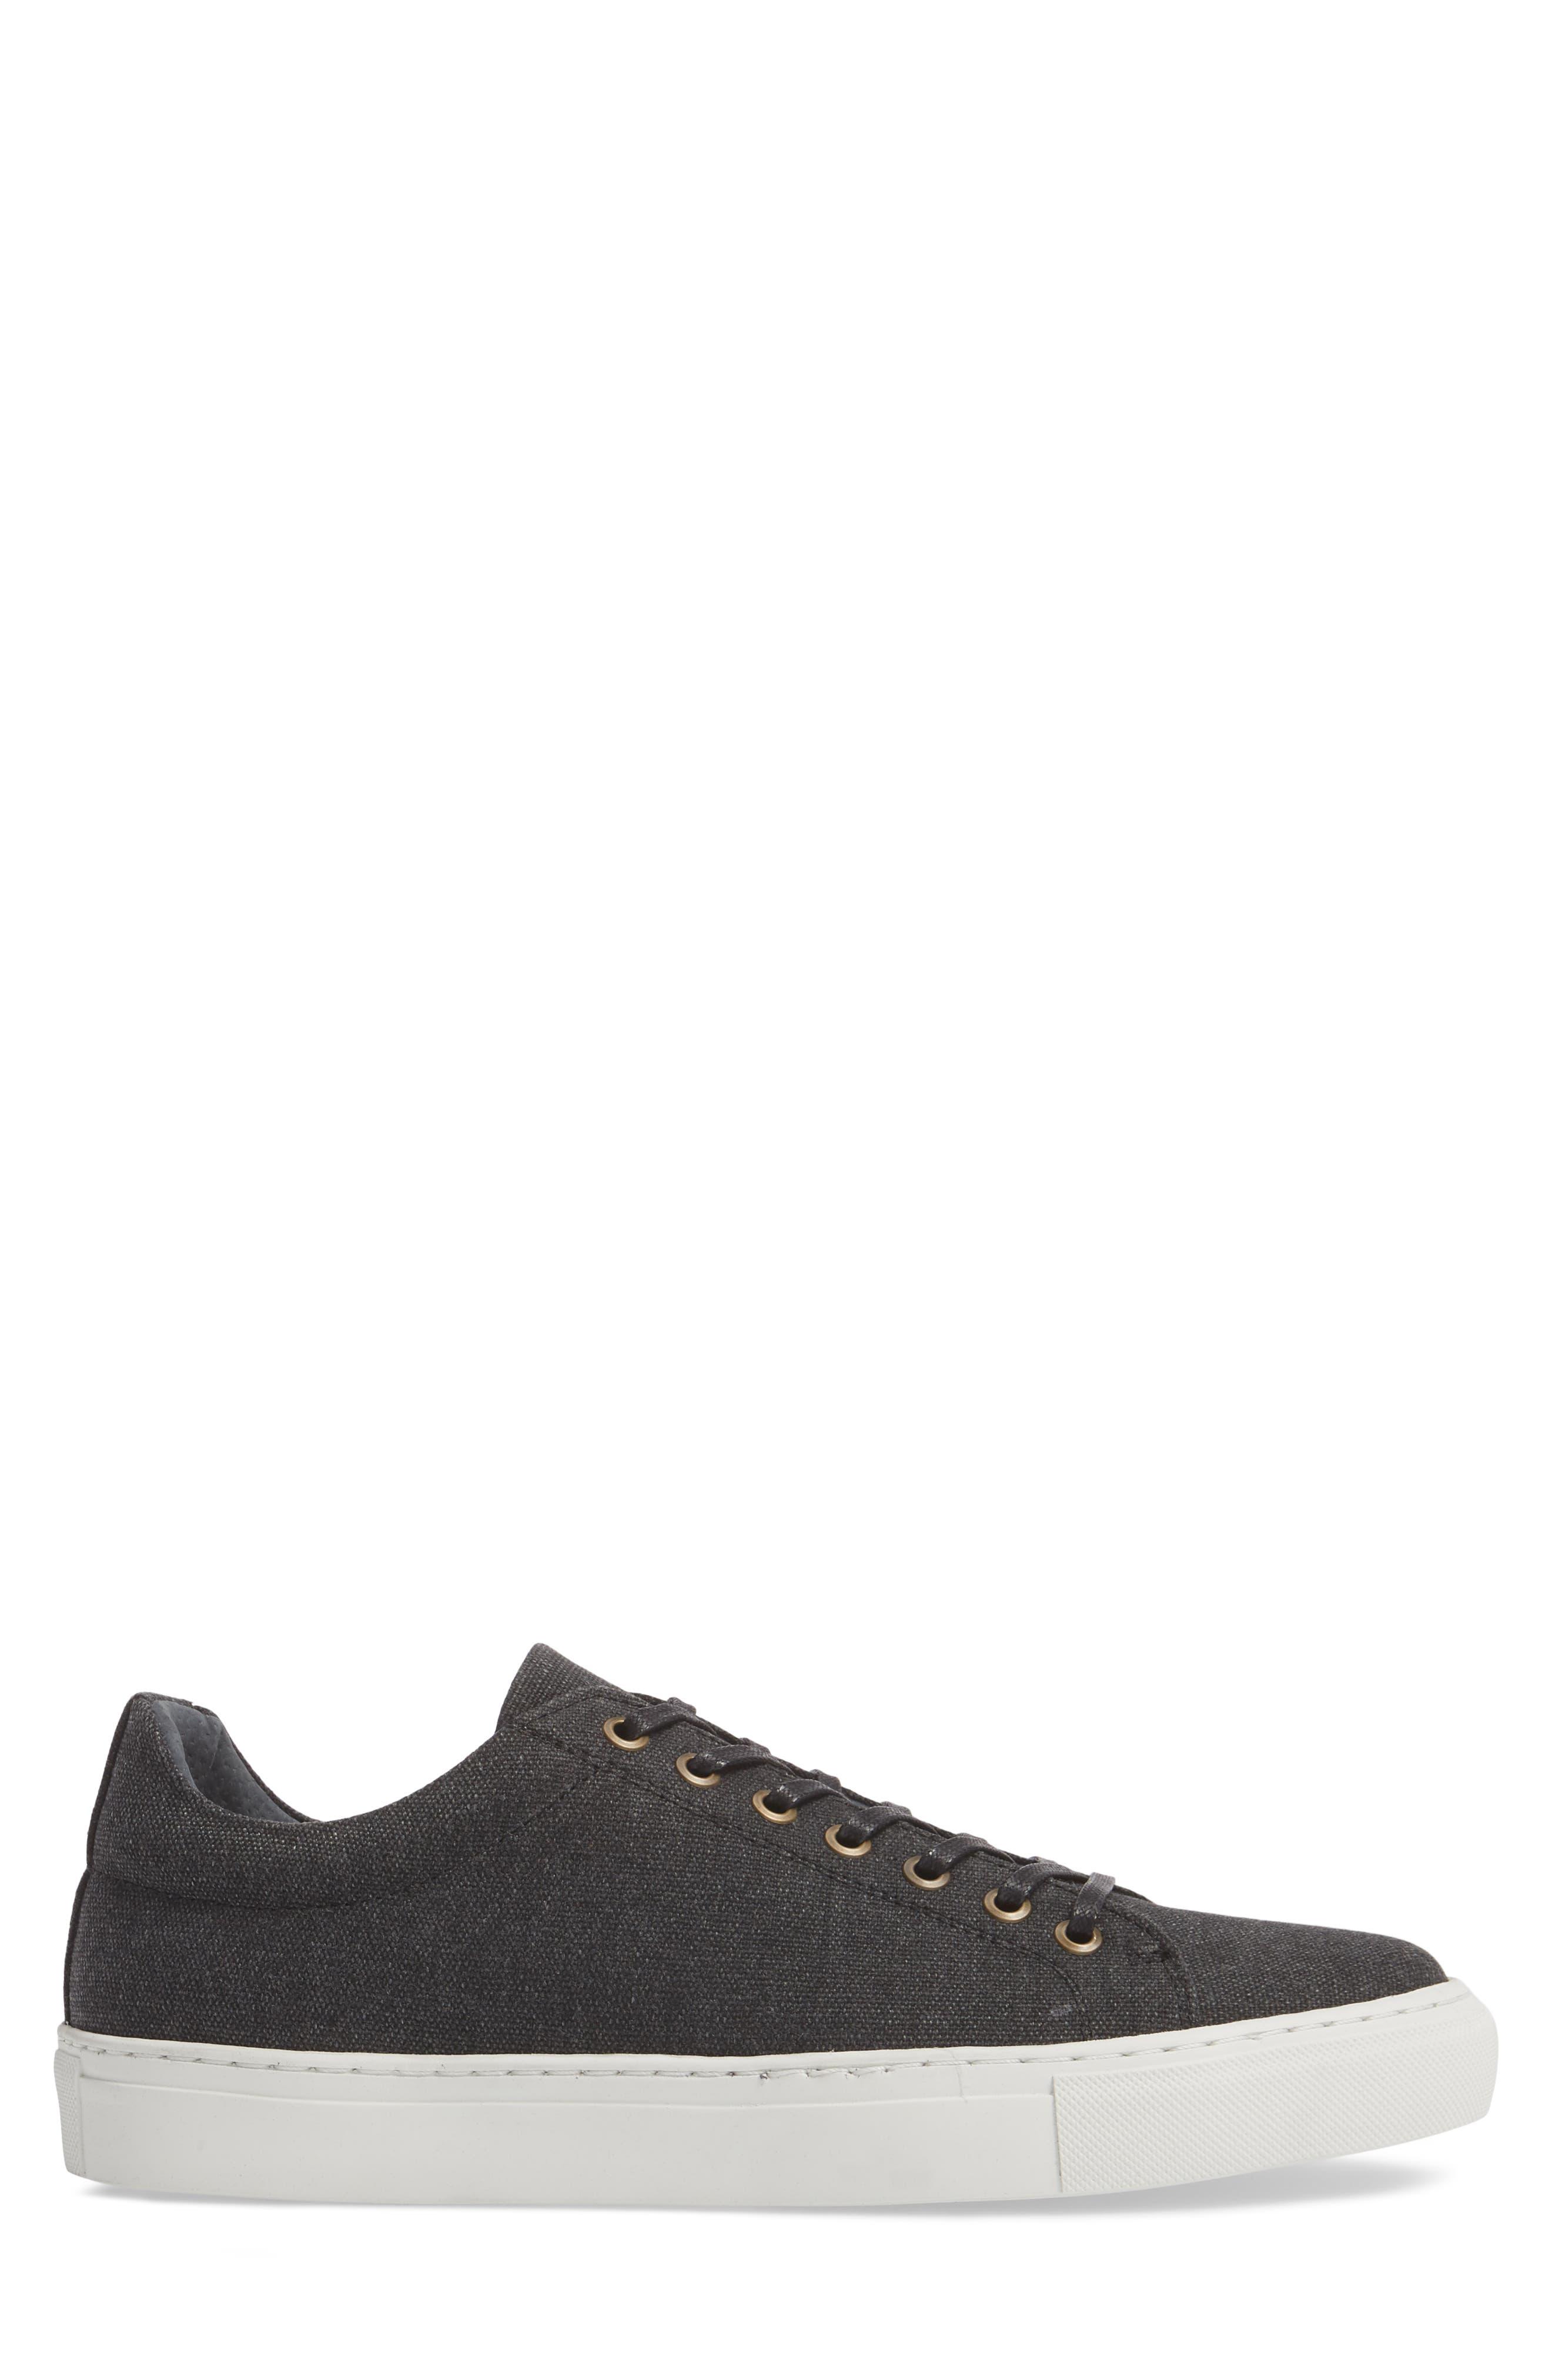 Mark Low Top Sneaker,                             Alternate thumbnail 3, color,                             Black Canvas